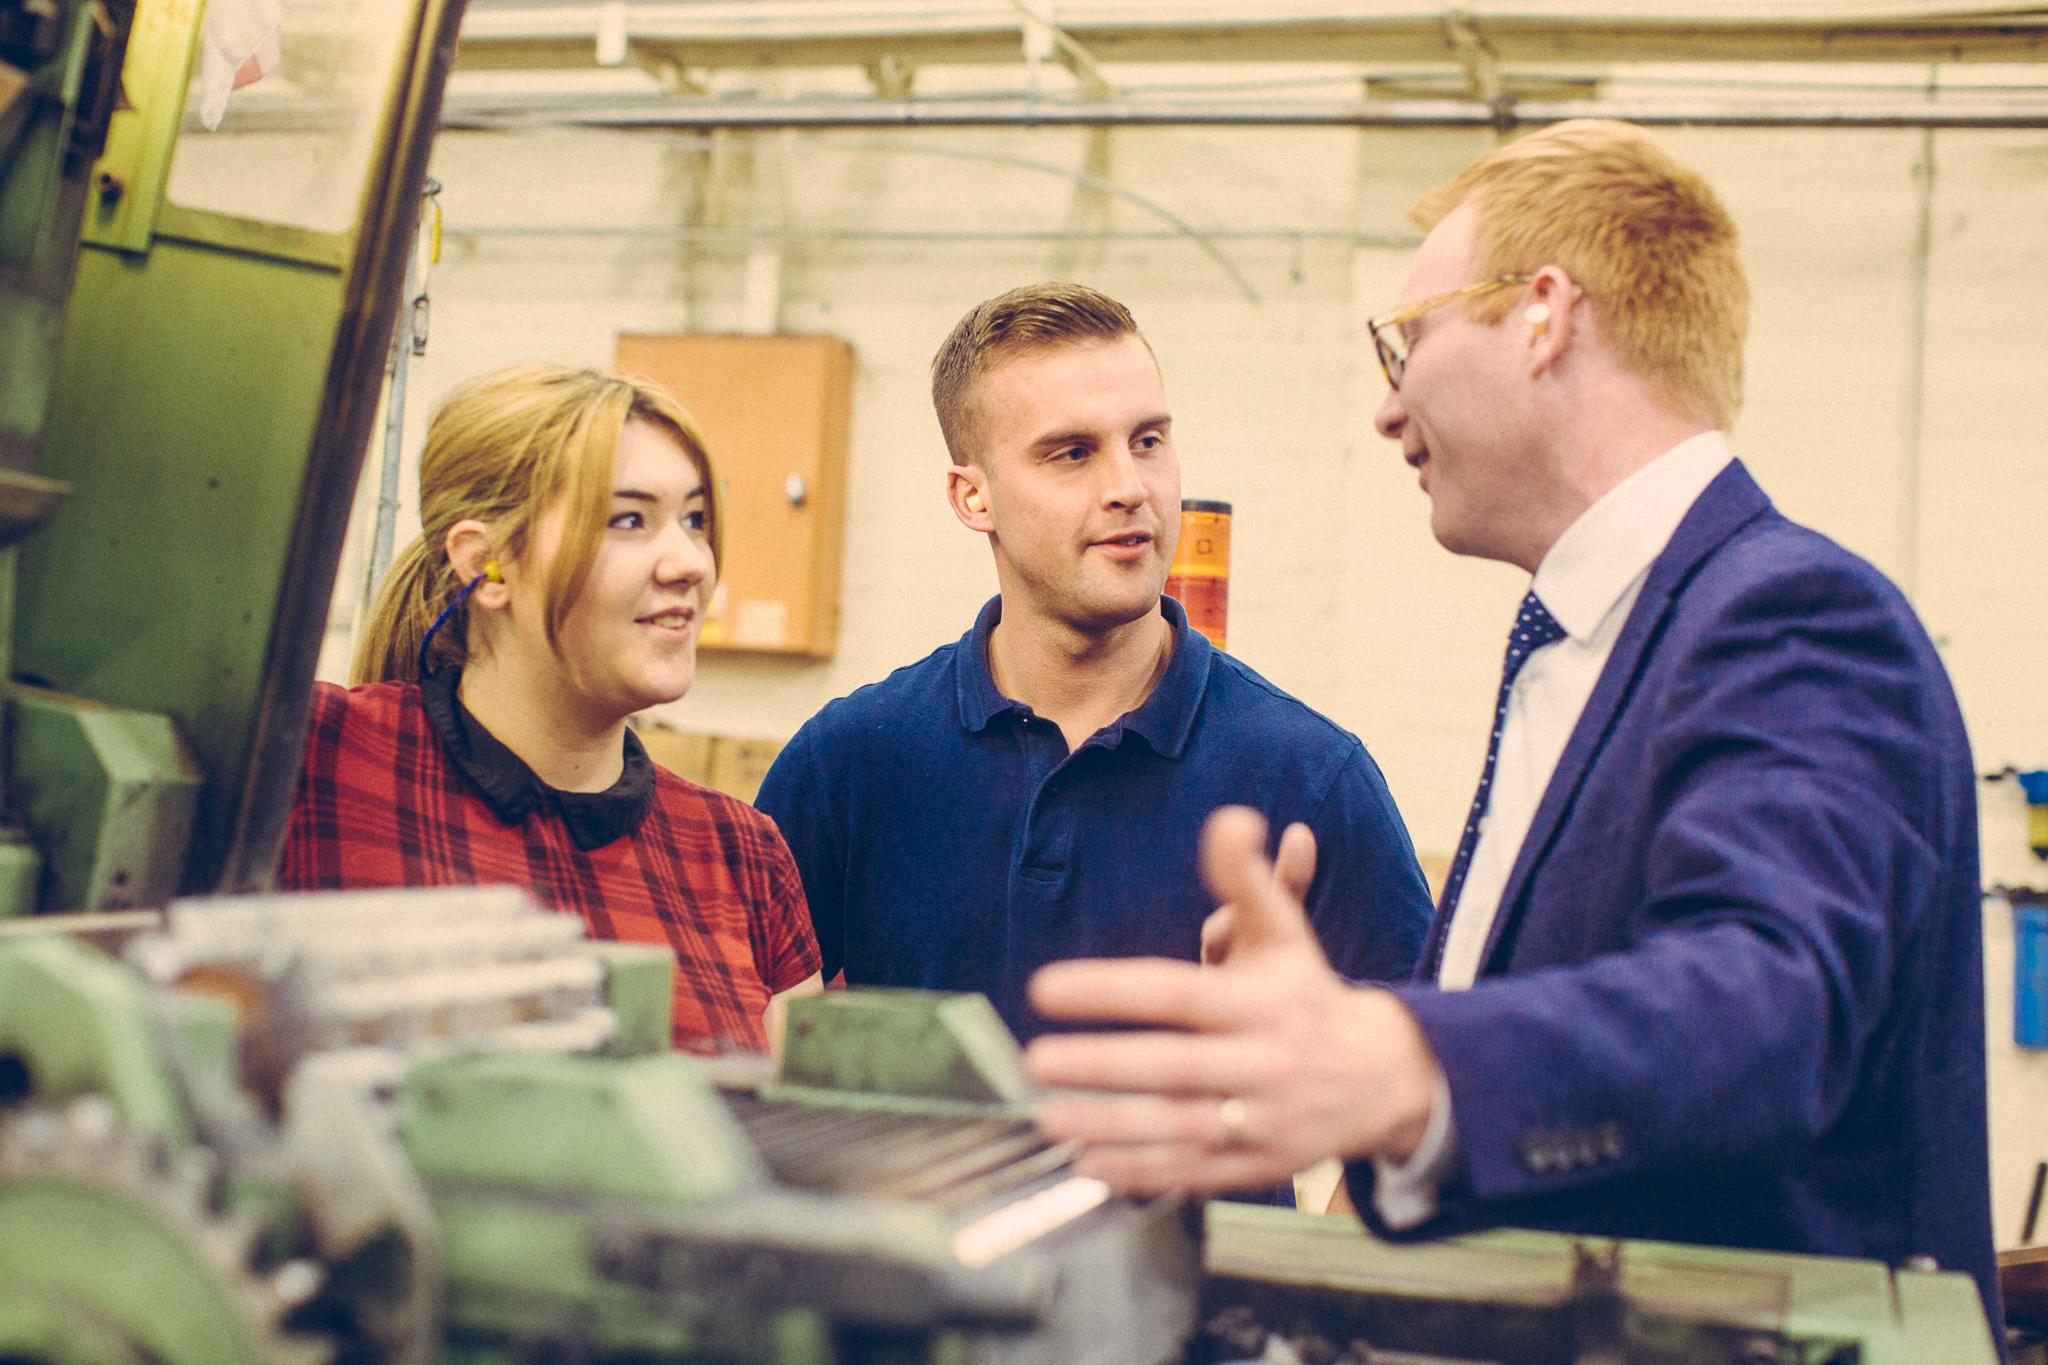 Trainees Alana Williamson & Ed Naylor with Sales Manager Gareth Jones